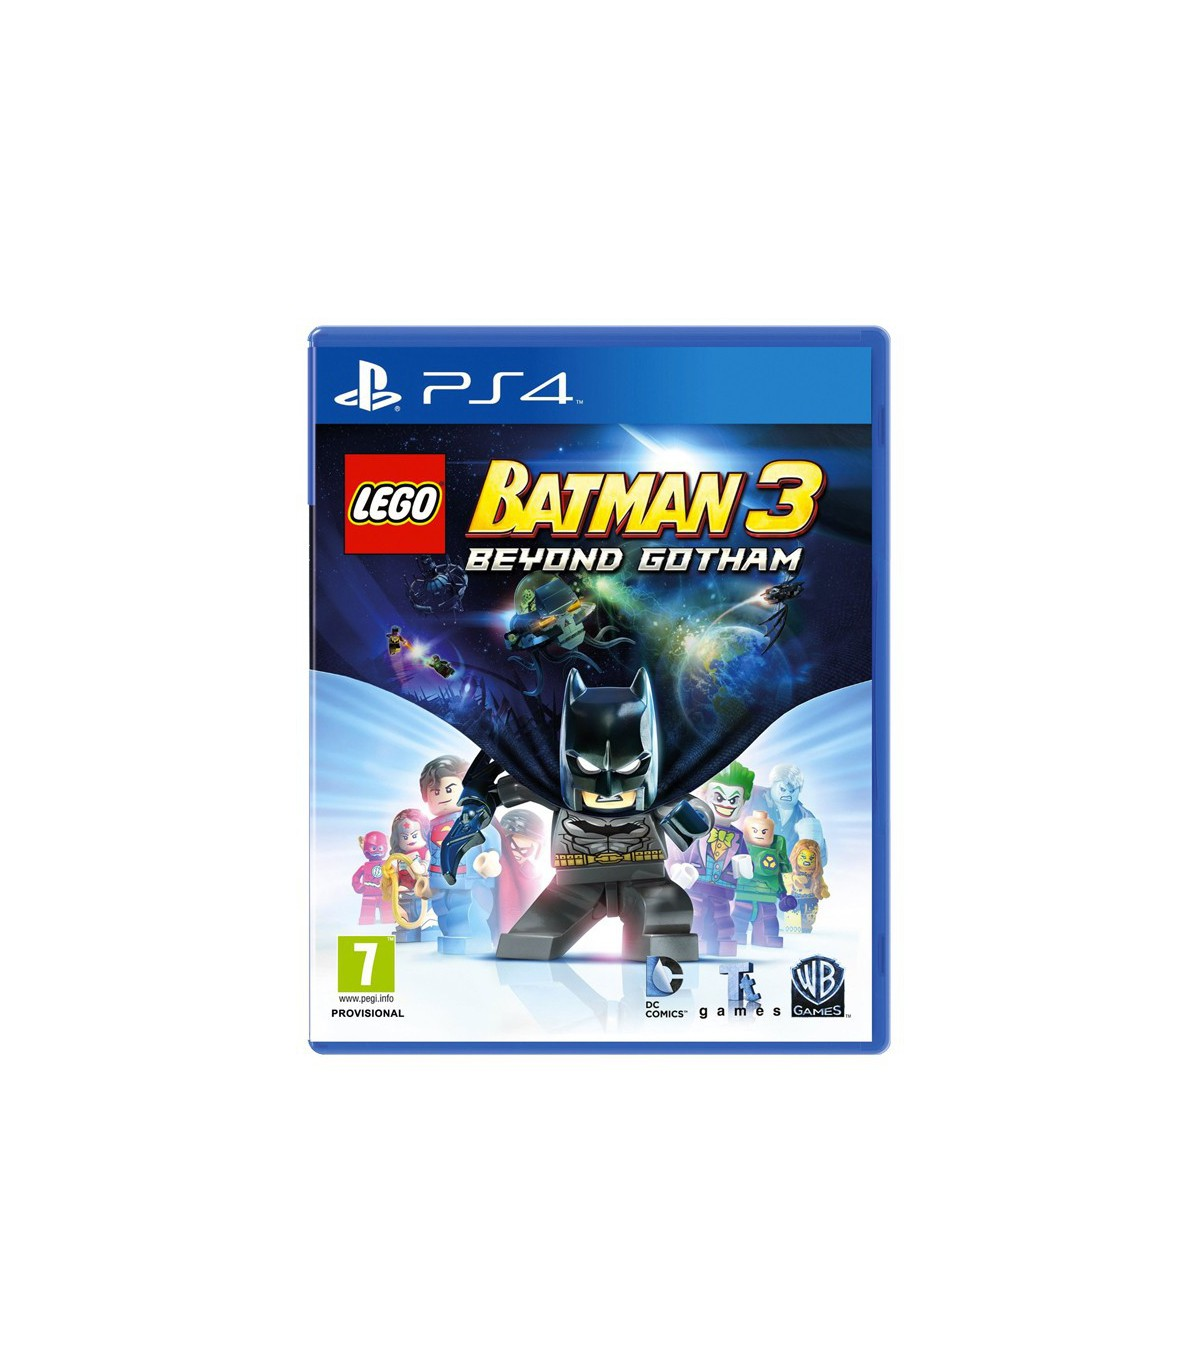 Lego Batman 3 : Beyond Gotham کارکرده - پلی استیشن ۴